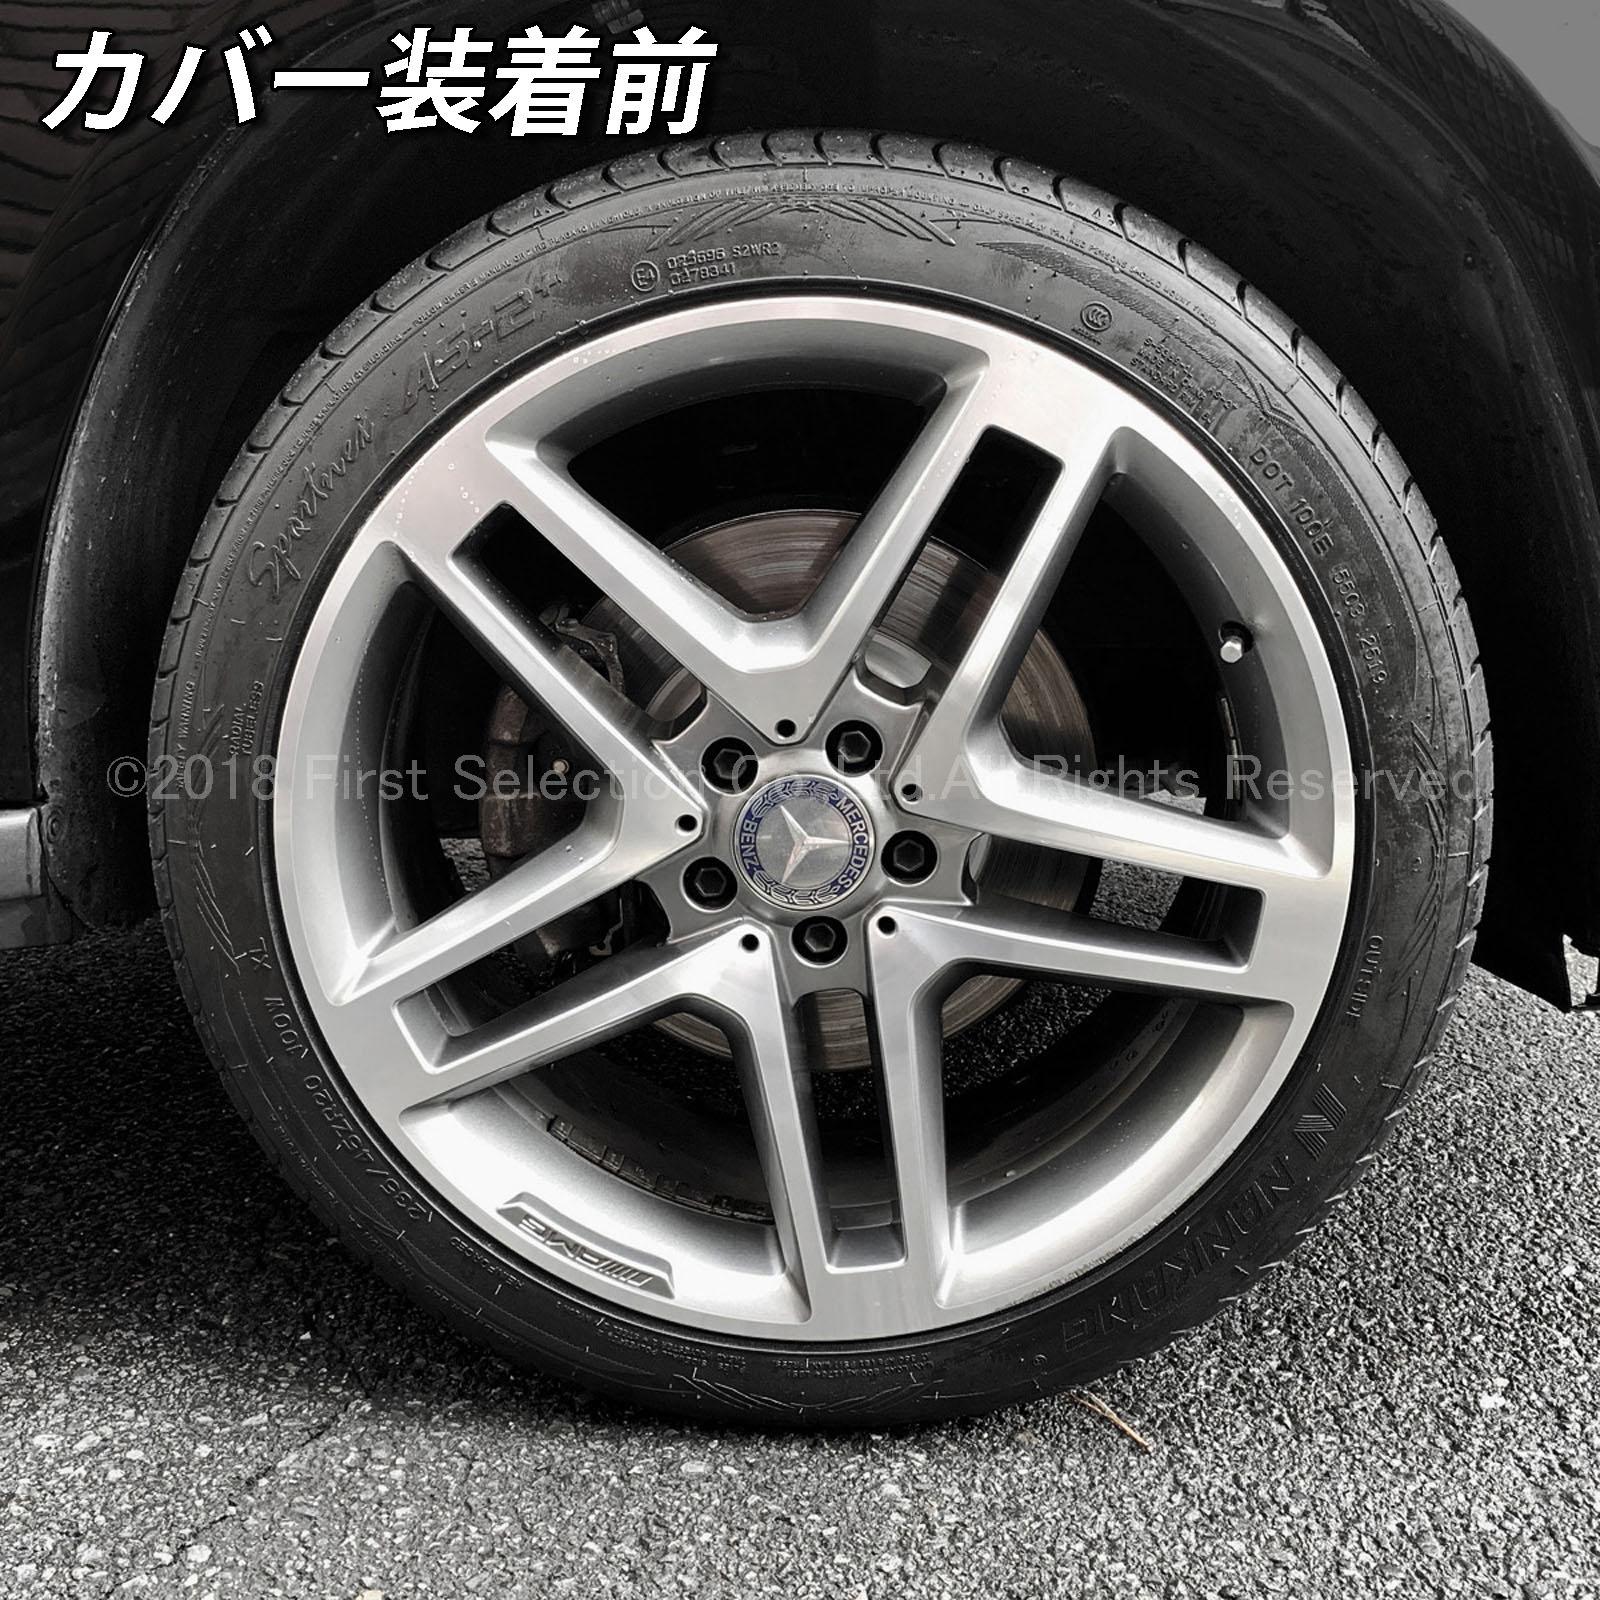 Mercedes-Benz ベンツ AMG銀文字 GLK X204用 高耐久金属製キャリパーカバーセット赤 X204 GLK350 GLK300